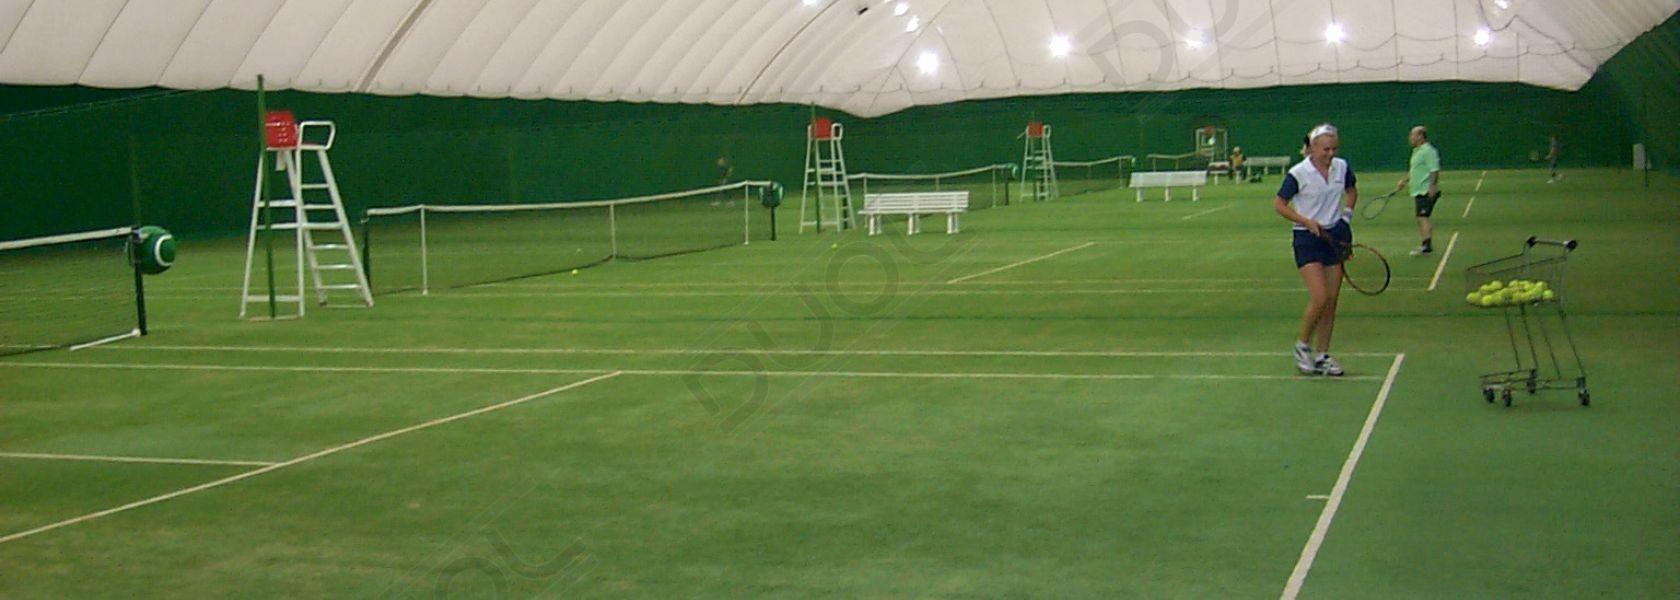 Tennis Airdome Oktober 1